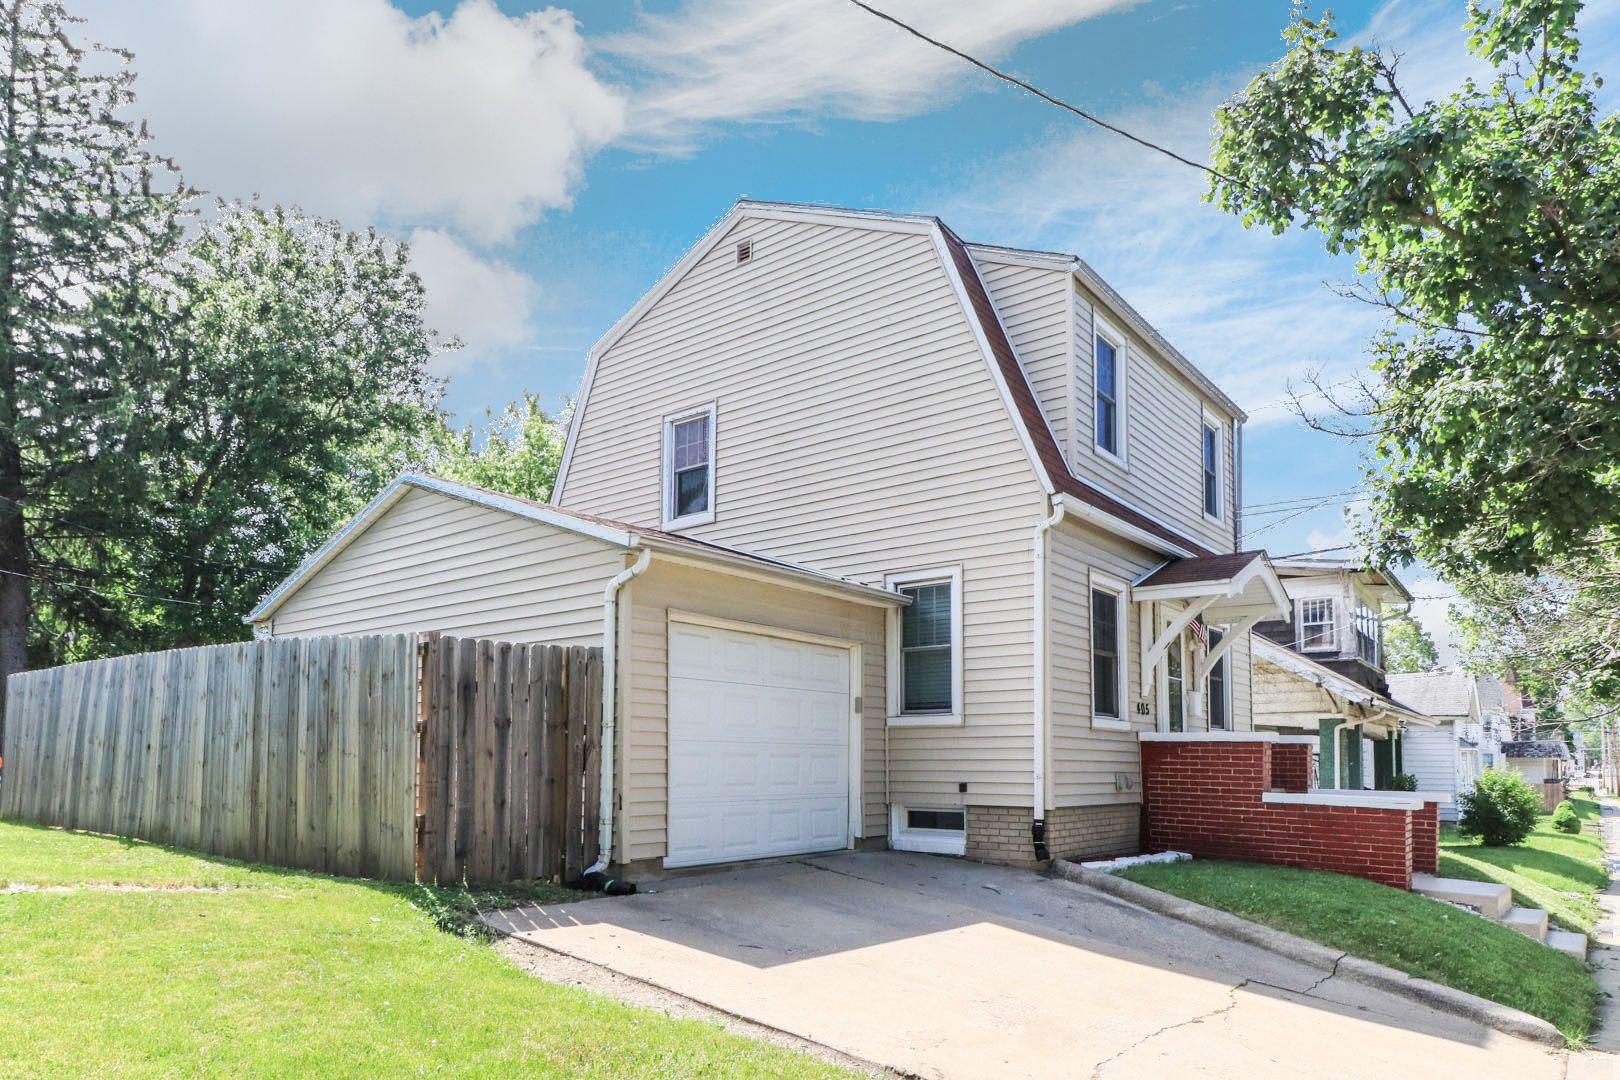 405 N Clinton Street, Bloomington, IL 61701 – SOLD!